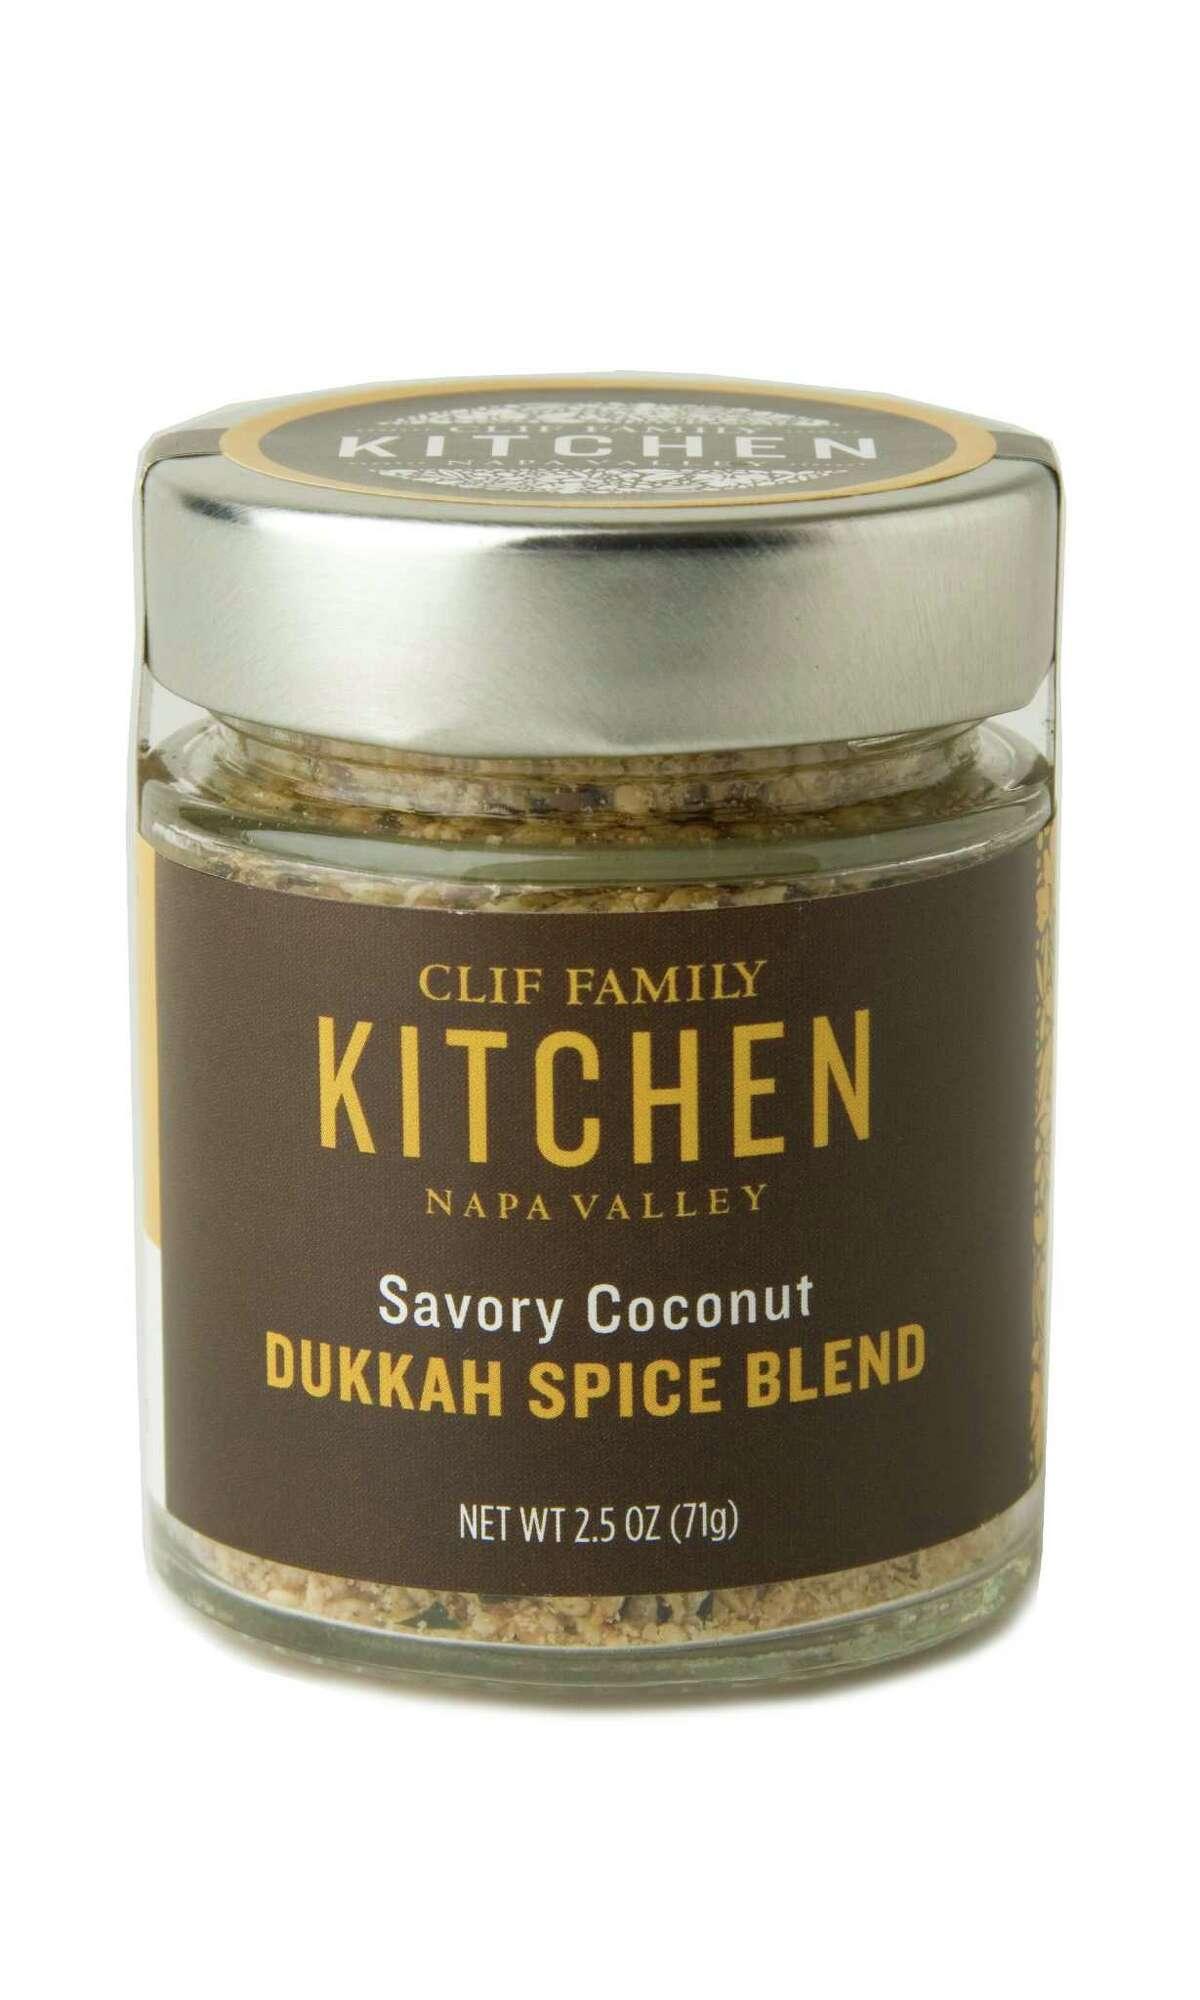 Clif Family Kitchen's Savory Coconut Dukkah Spice Blend.